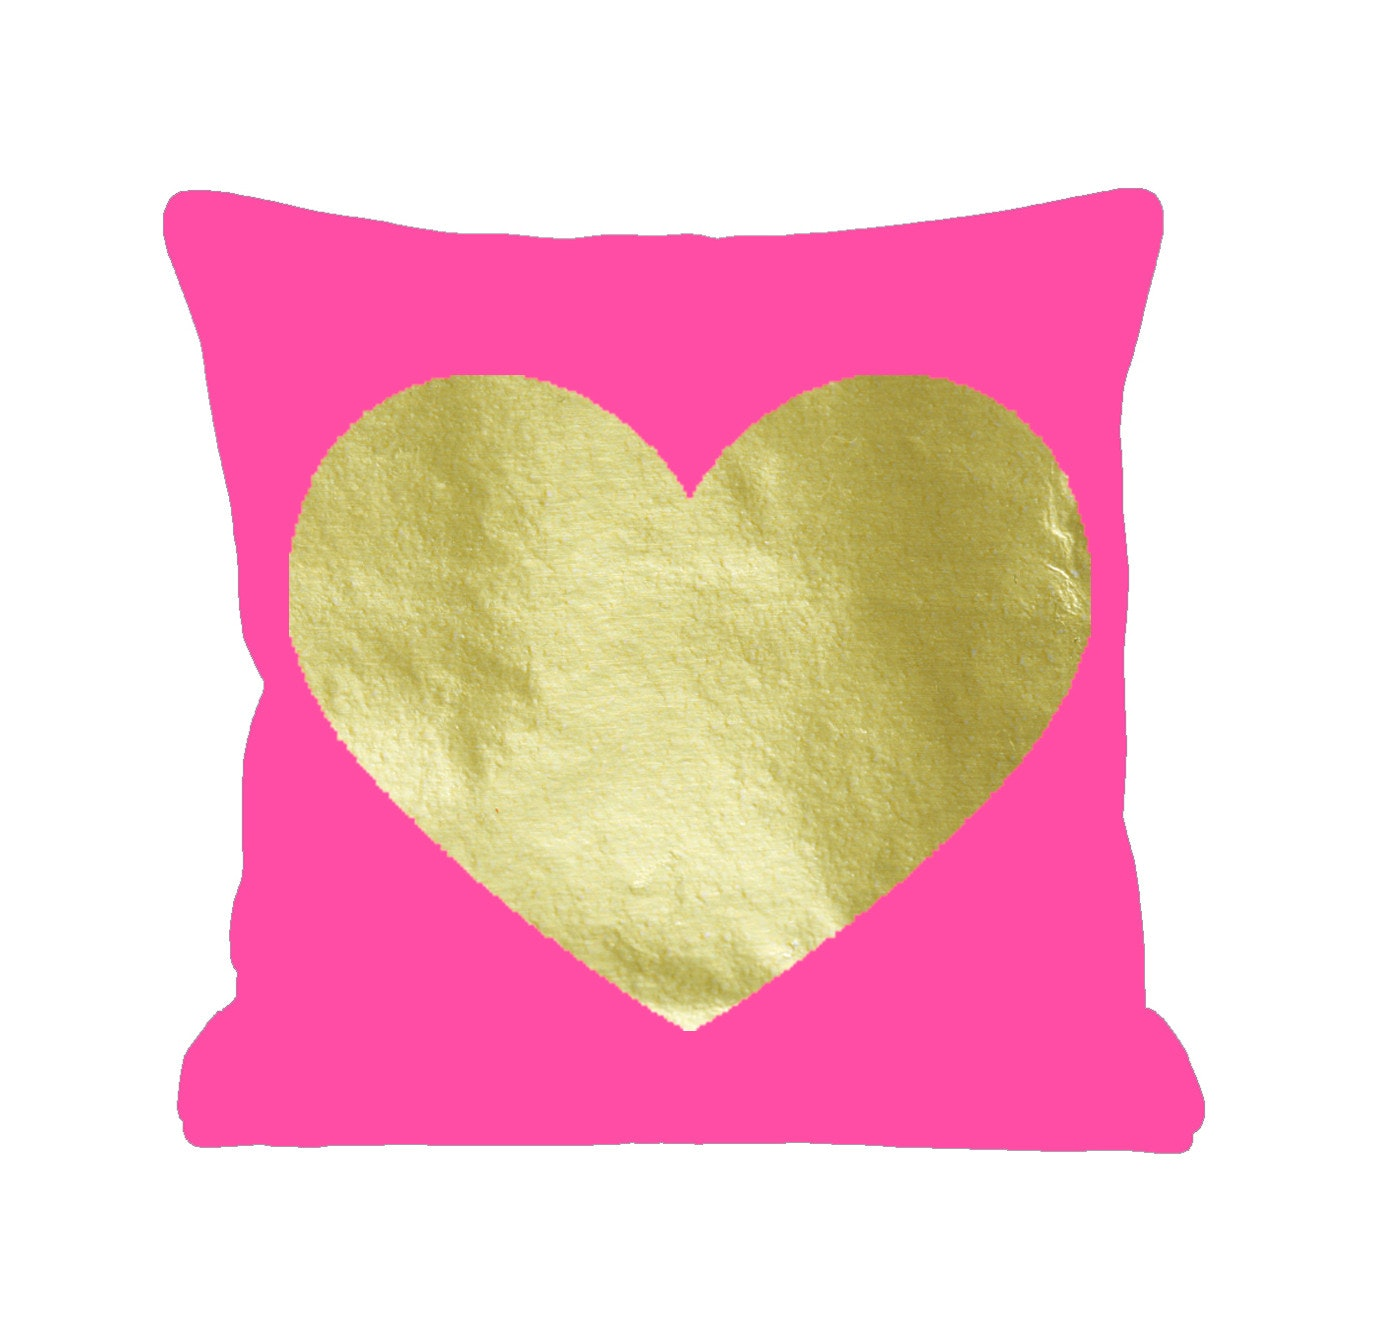 J14 Decorate: Aspen Lane Heart Pillow sweepstakes